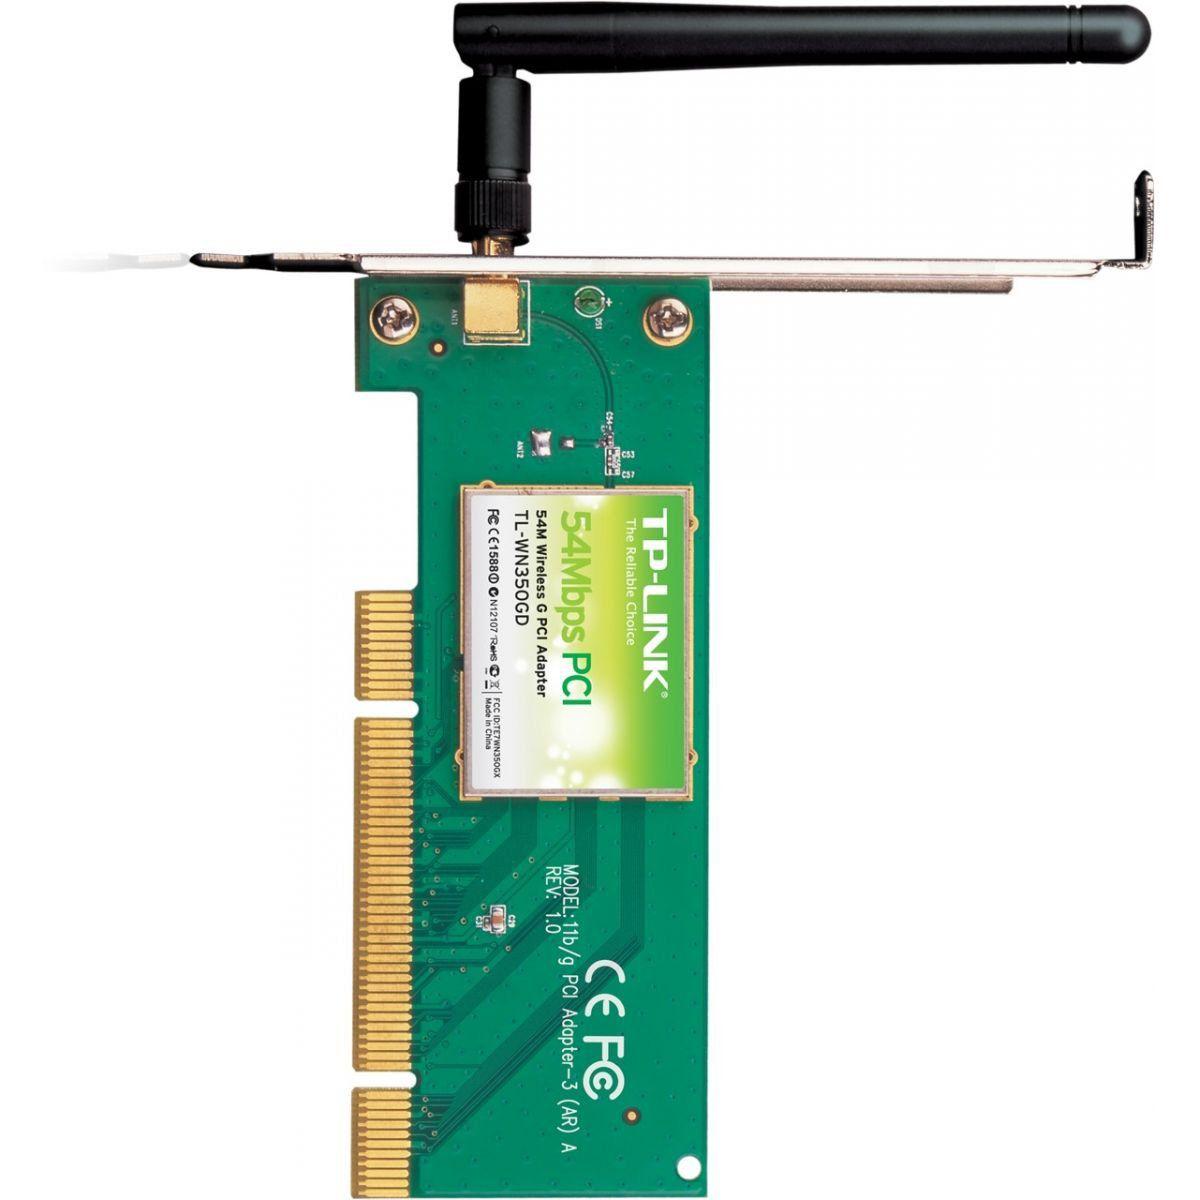 Wireless Adaptador Pci Tp-Link Tl-Wn350gd 54mbps